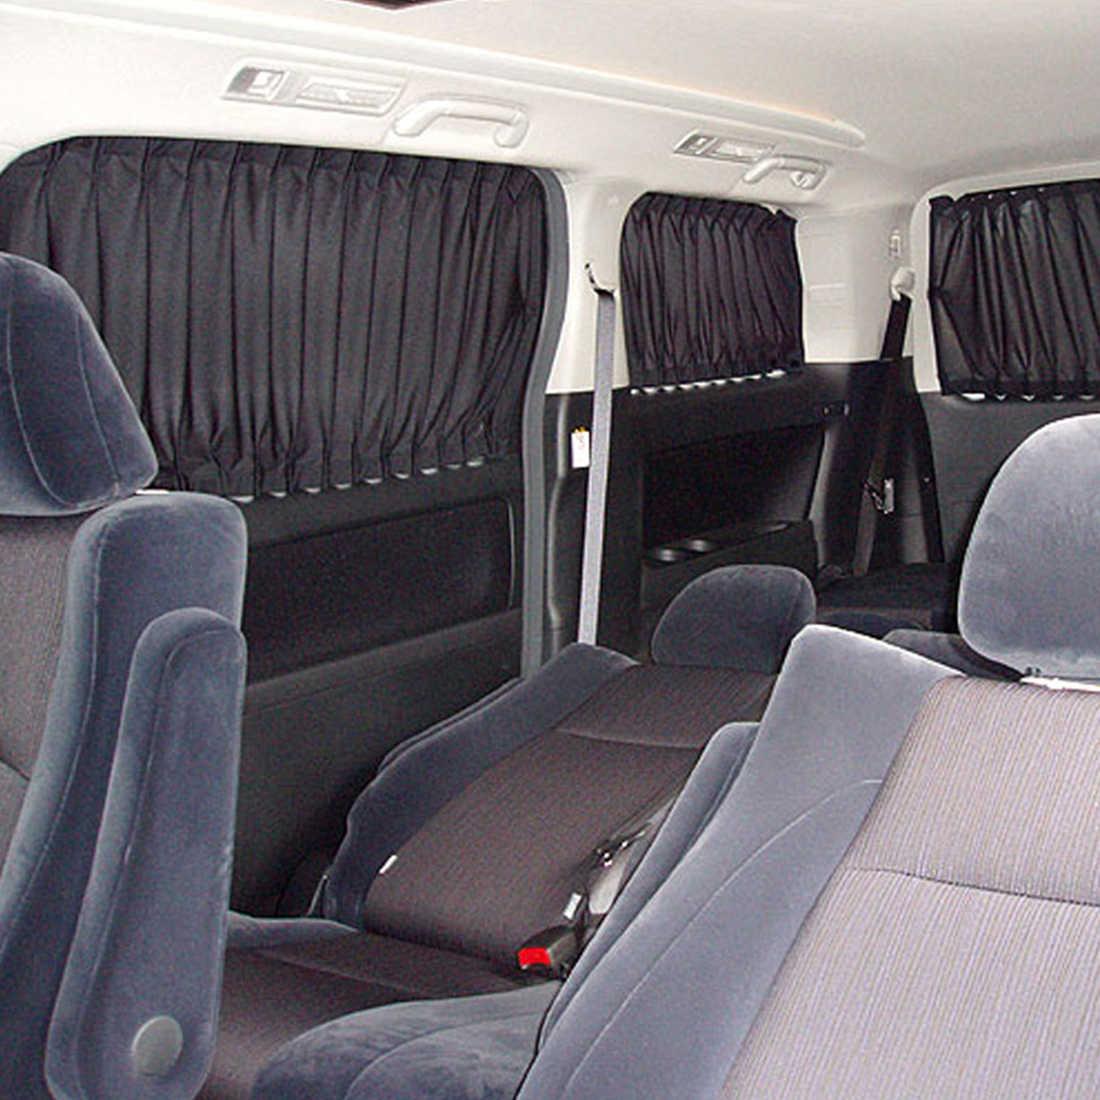 2pcs รถ Universal คู่อลูมิเนียม TRACK ประเภทรถผ้าม่านอลูมิเนียมยืดหยุ่นรถด้านข้างหน้าต่างม่านบังแดดอัตโนมัติ Windows